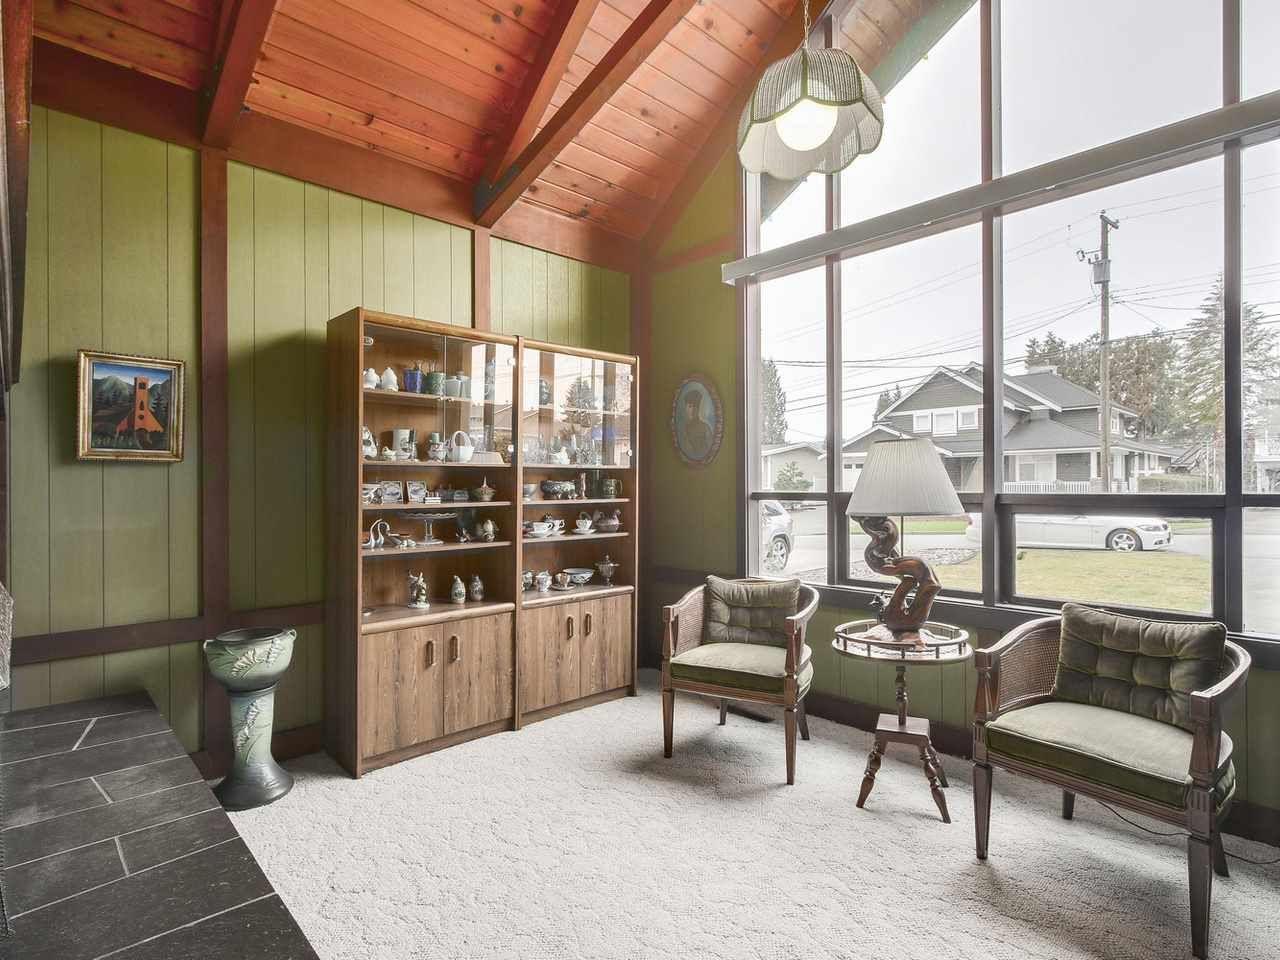 Photo 5: Photos: 1320 REGAN Avenue in Coquitlam: Central Coquitlam House for sale : MLS®# R2147096